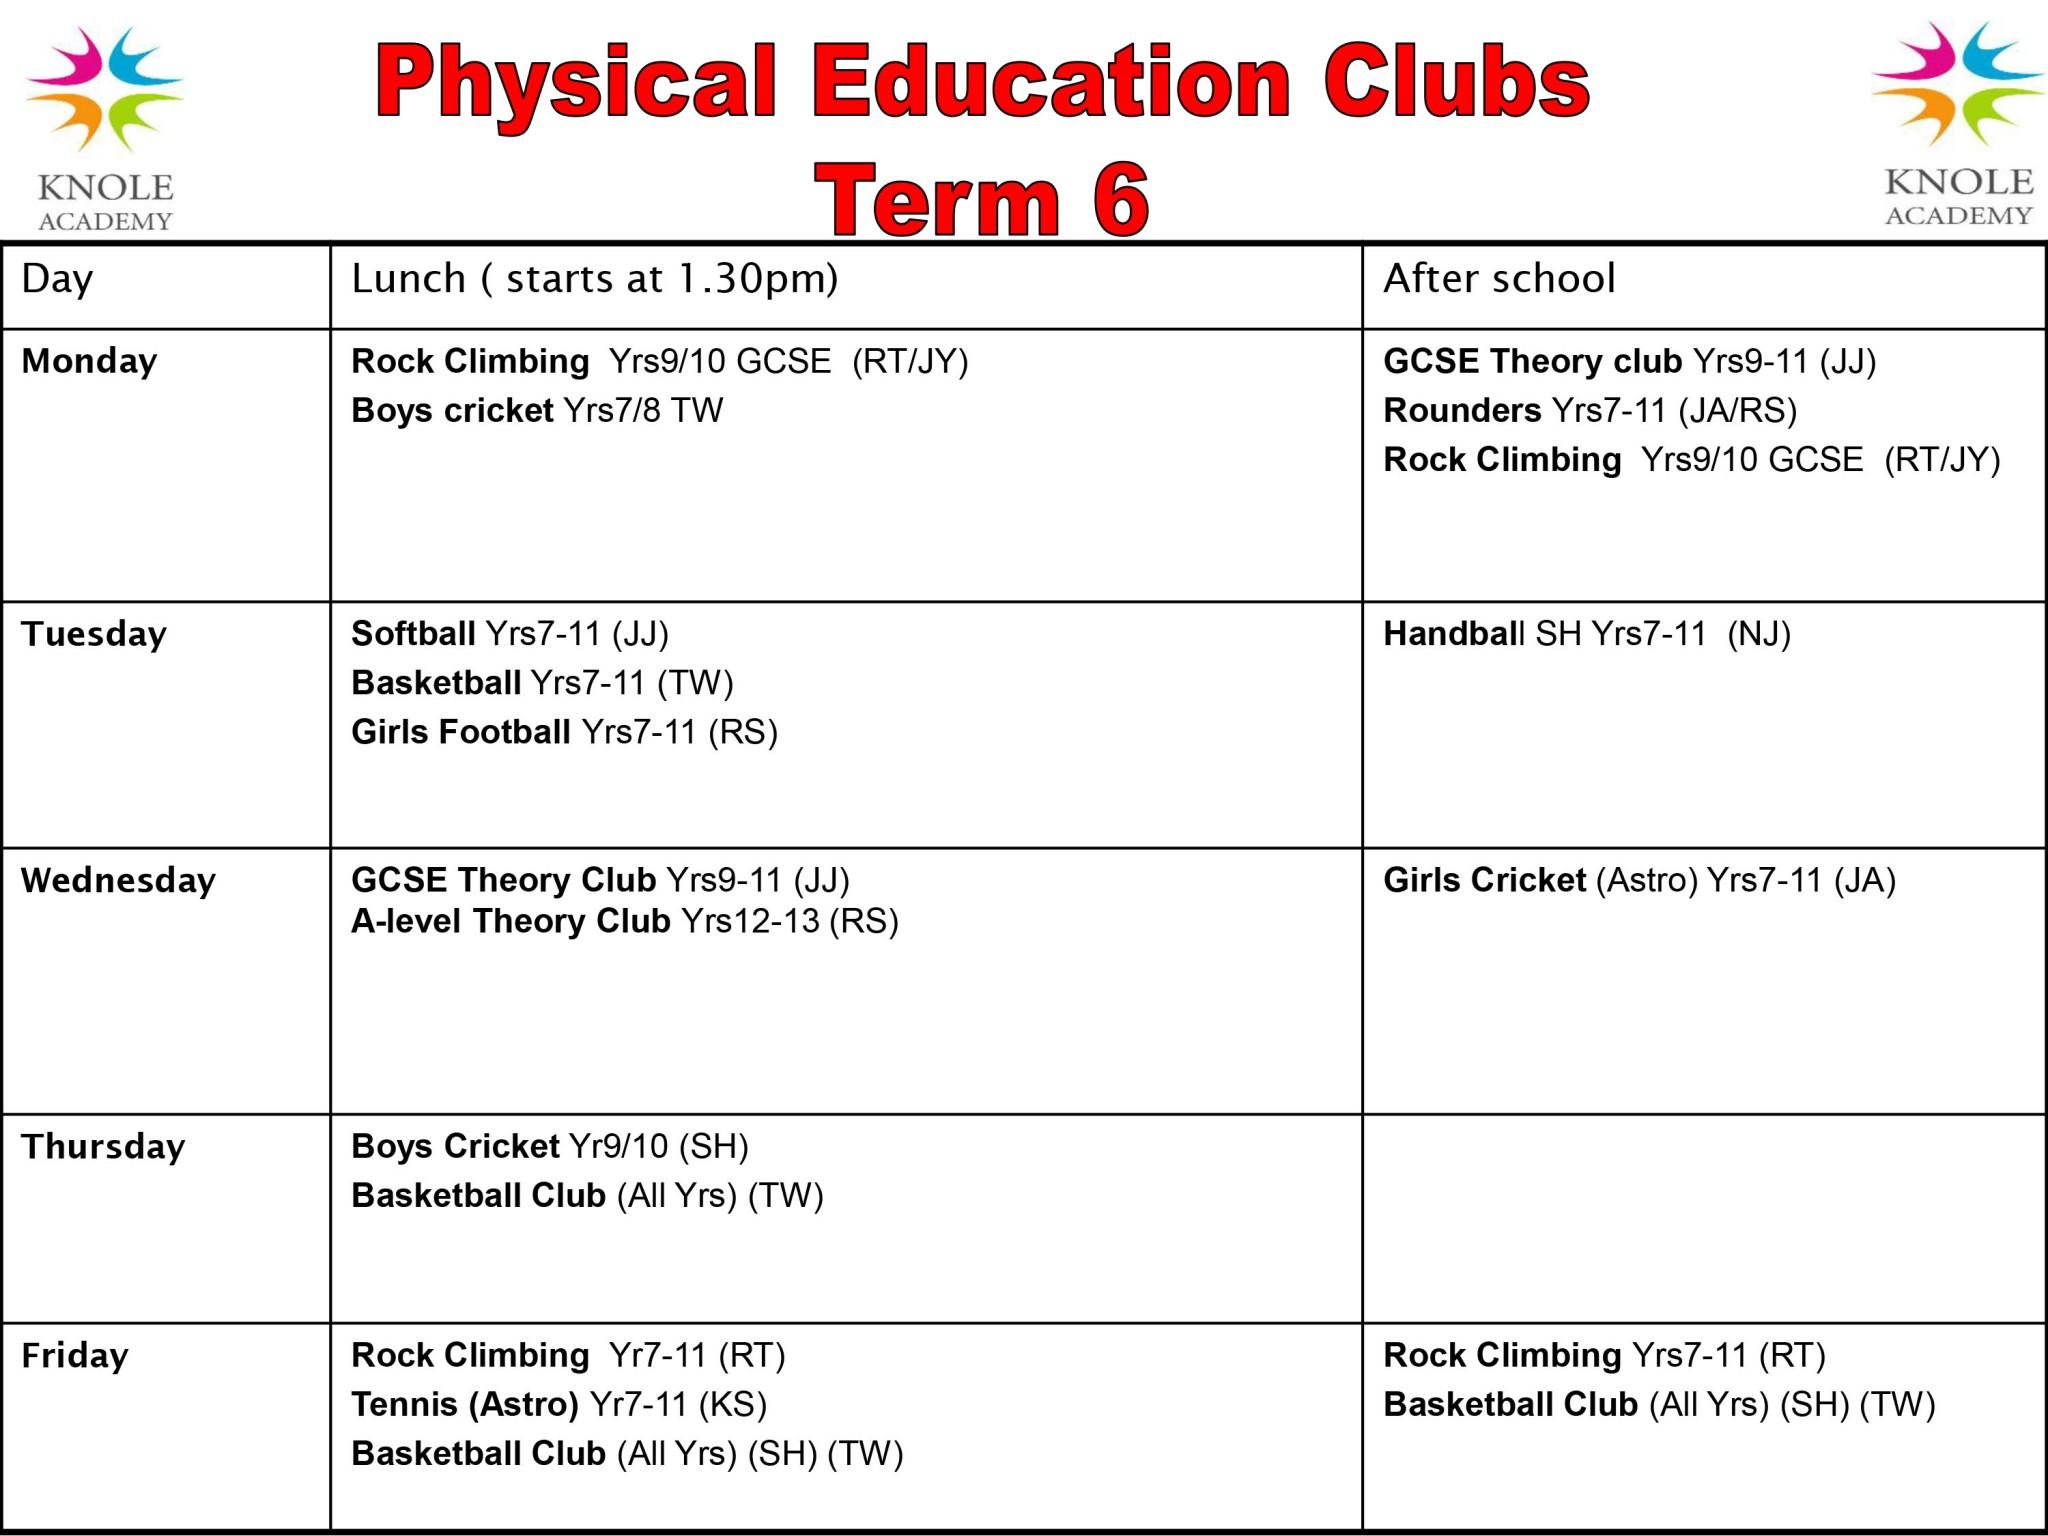 PE Clubs Timetable Term 6 2018